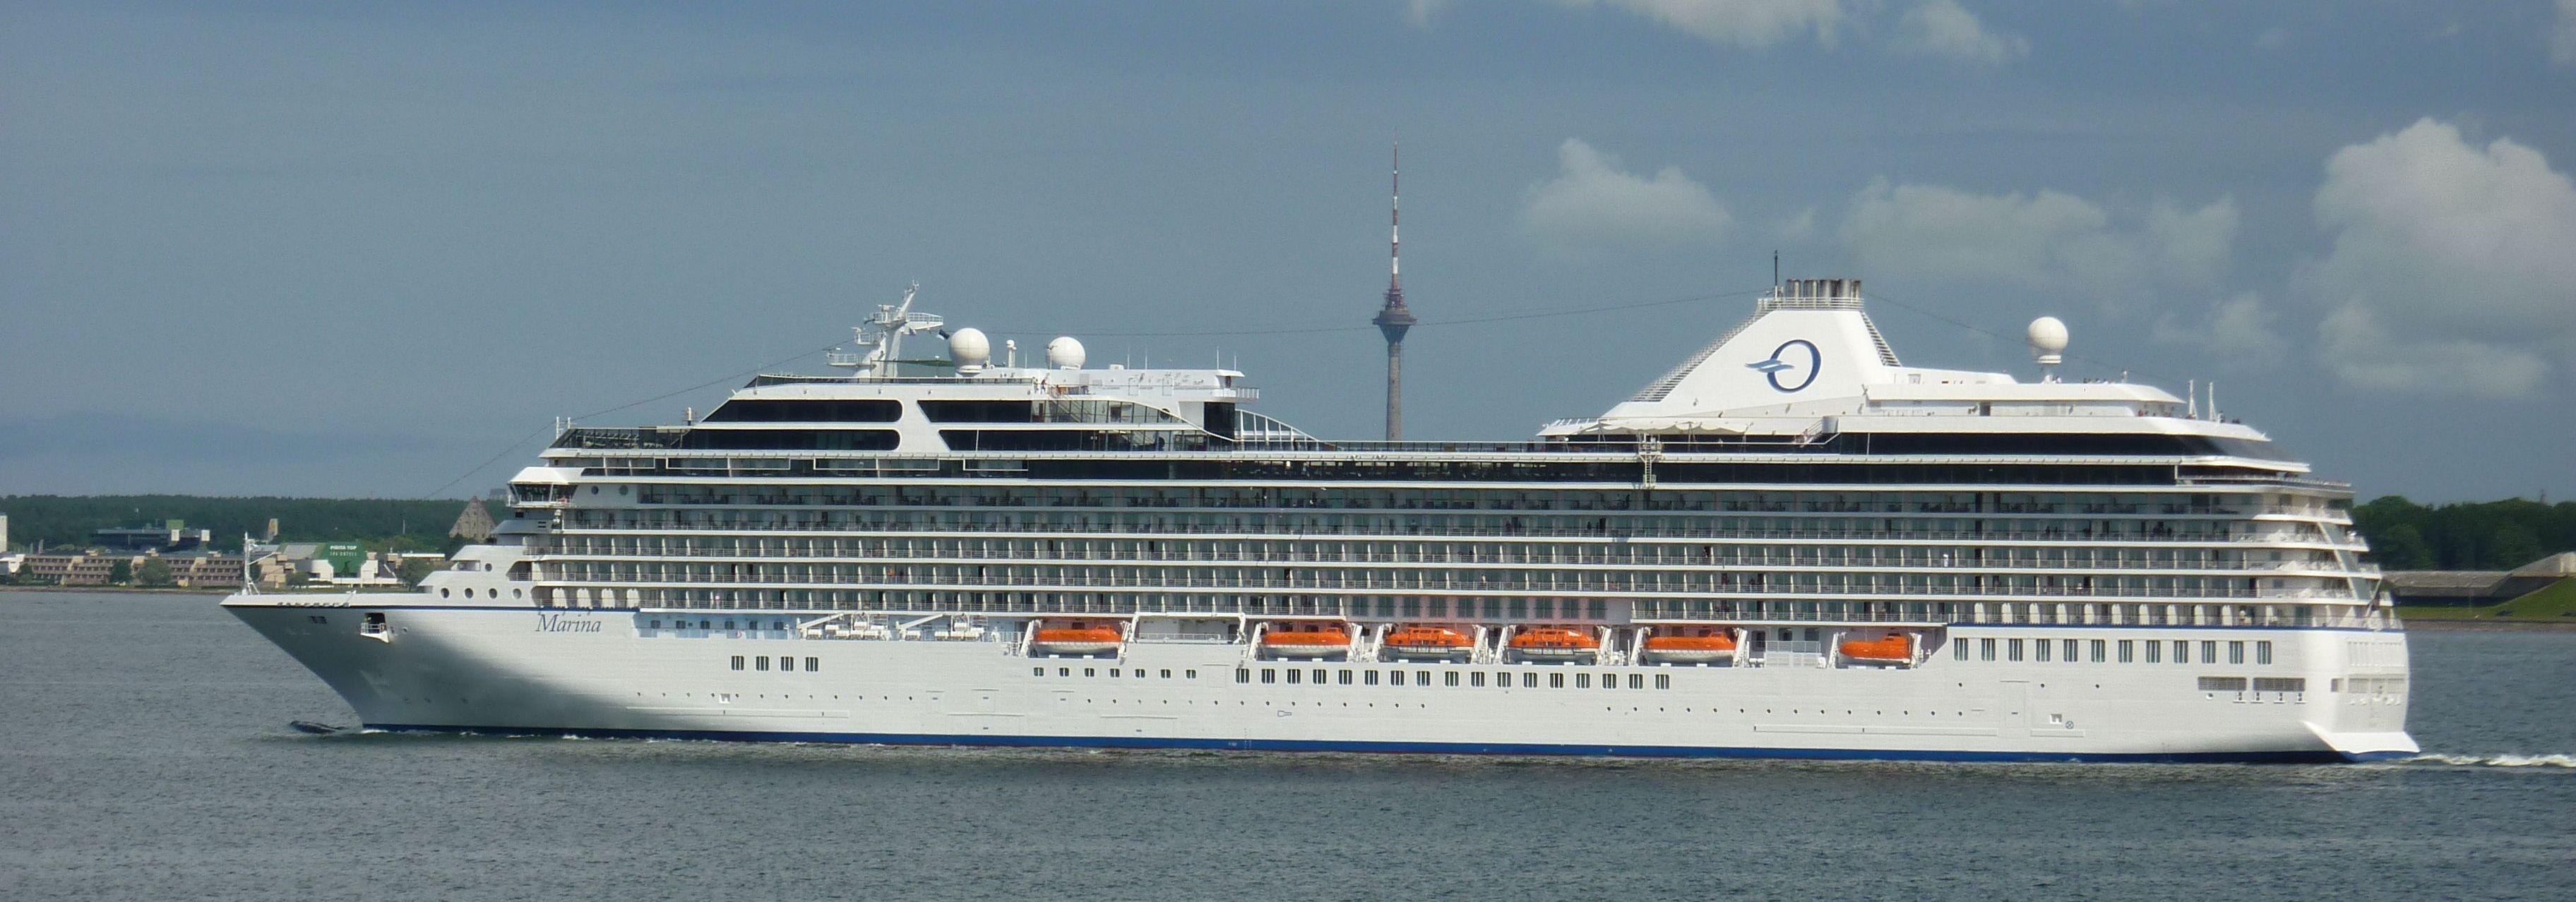 Marina – Oceania Cruises « Cruisereiziger